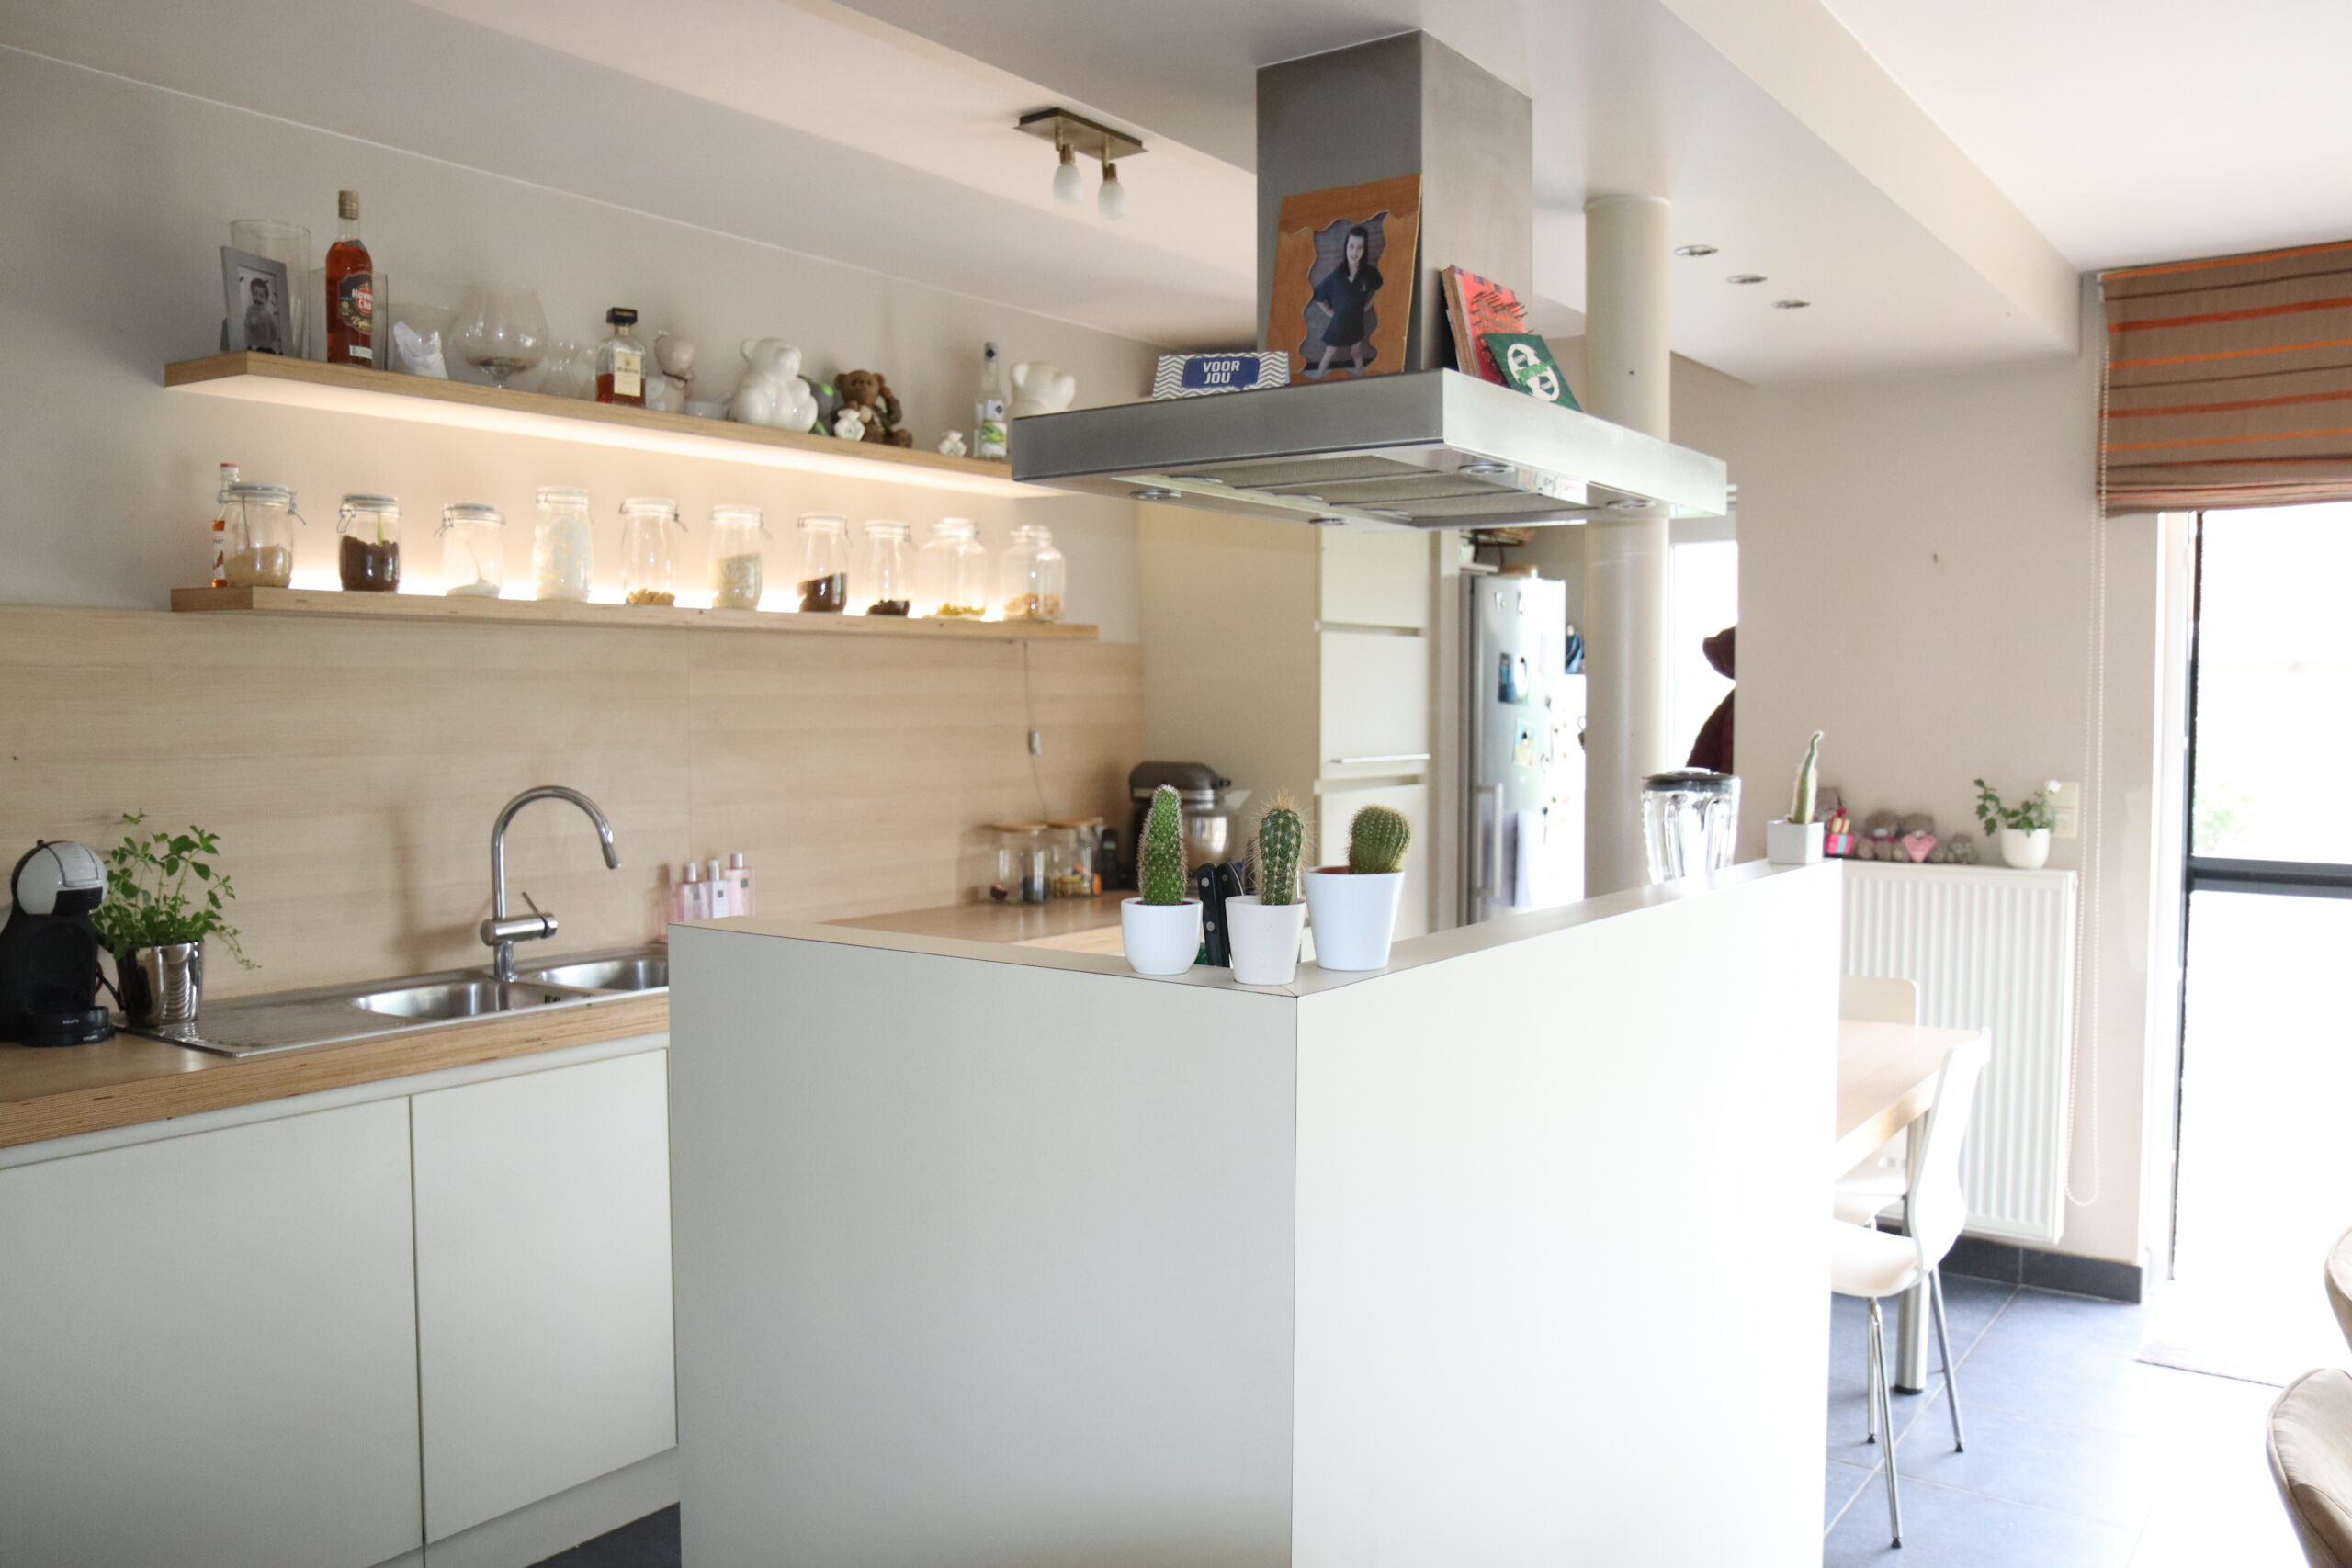 6 Keuken 2